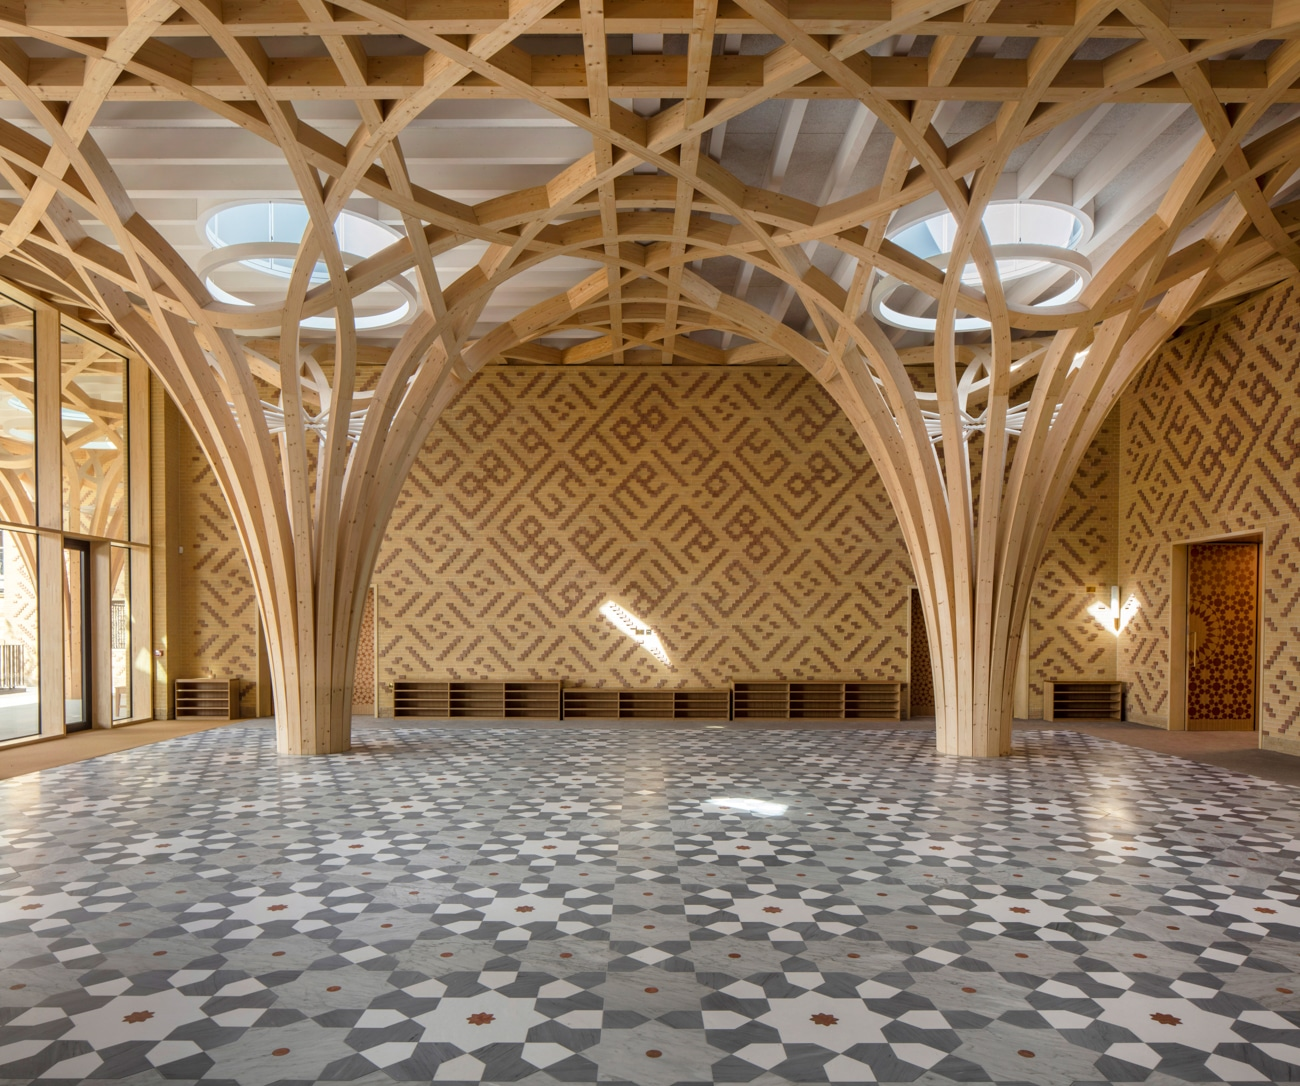 Marks_Barfield_Architects_Cambridge_Mosque_4.jpg